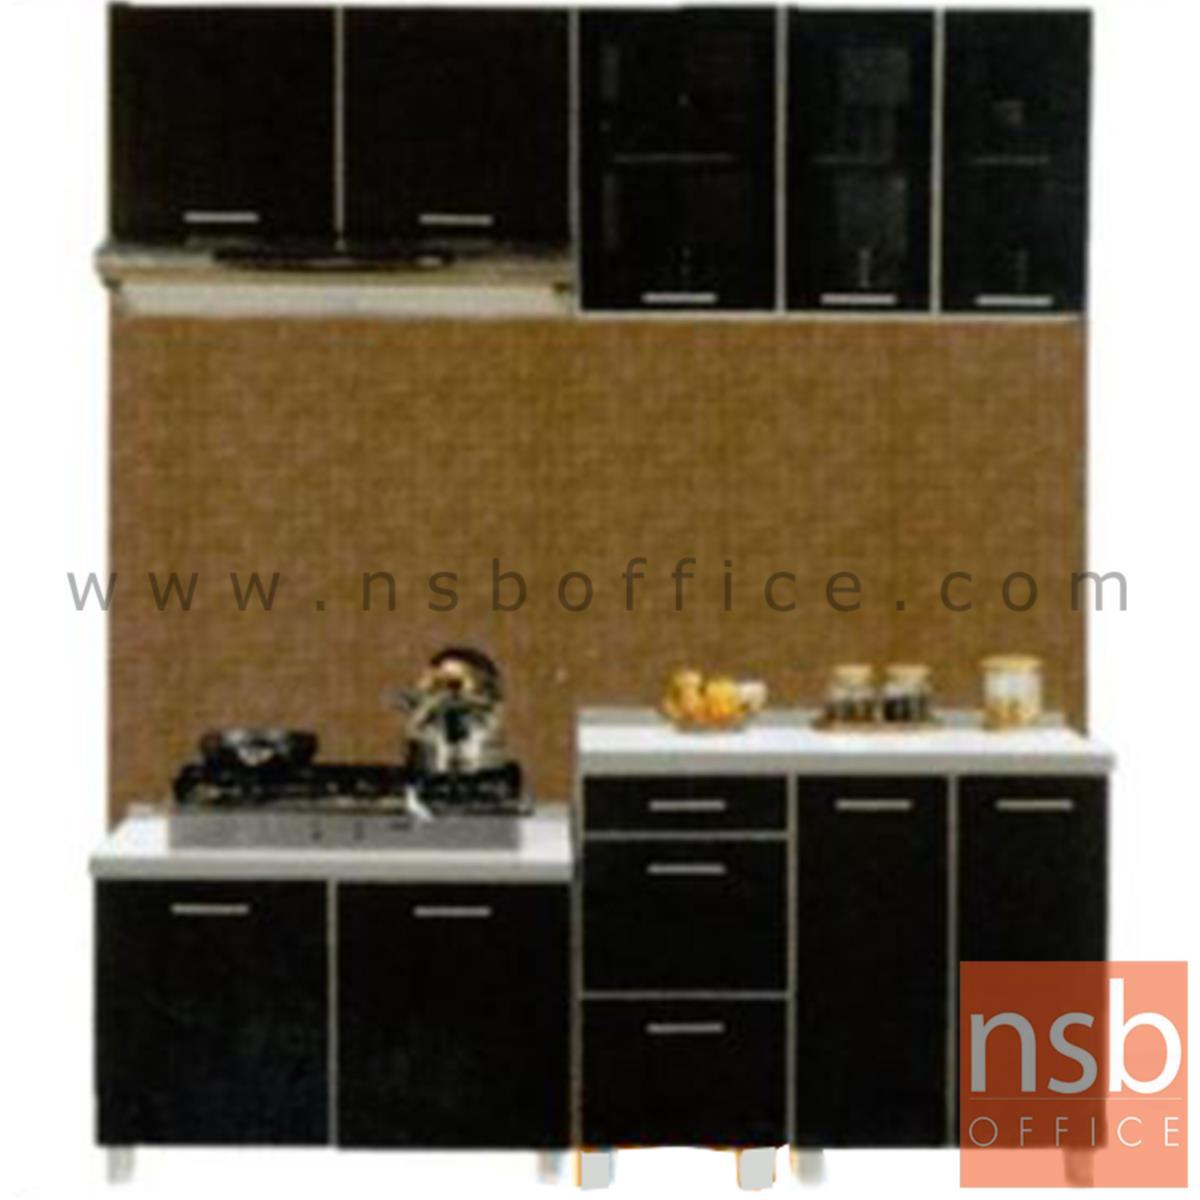 K01A025:ชุดตู้ครัวหน้าเรียบ 190W cm. รุ่น Darigold-190H  พร้อมตู้แขวนลอย